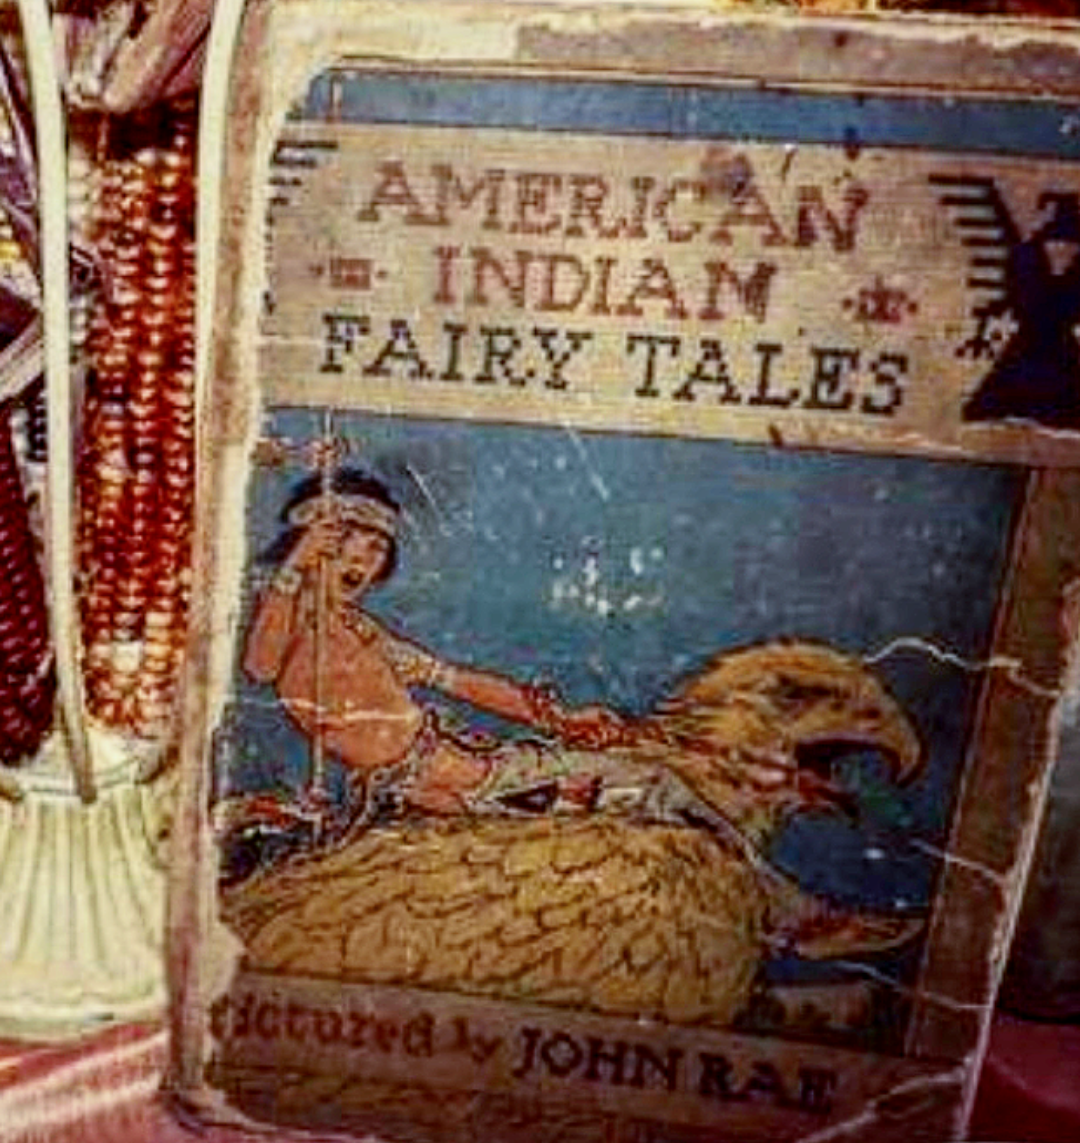 Antique American Indian Book